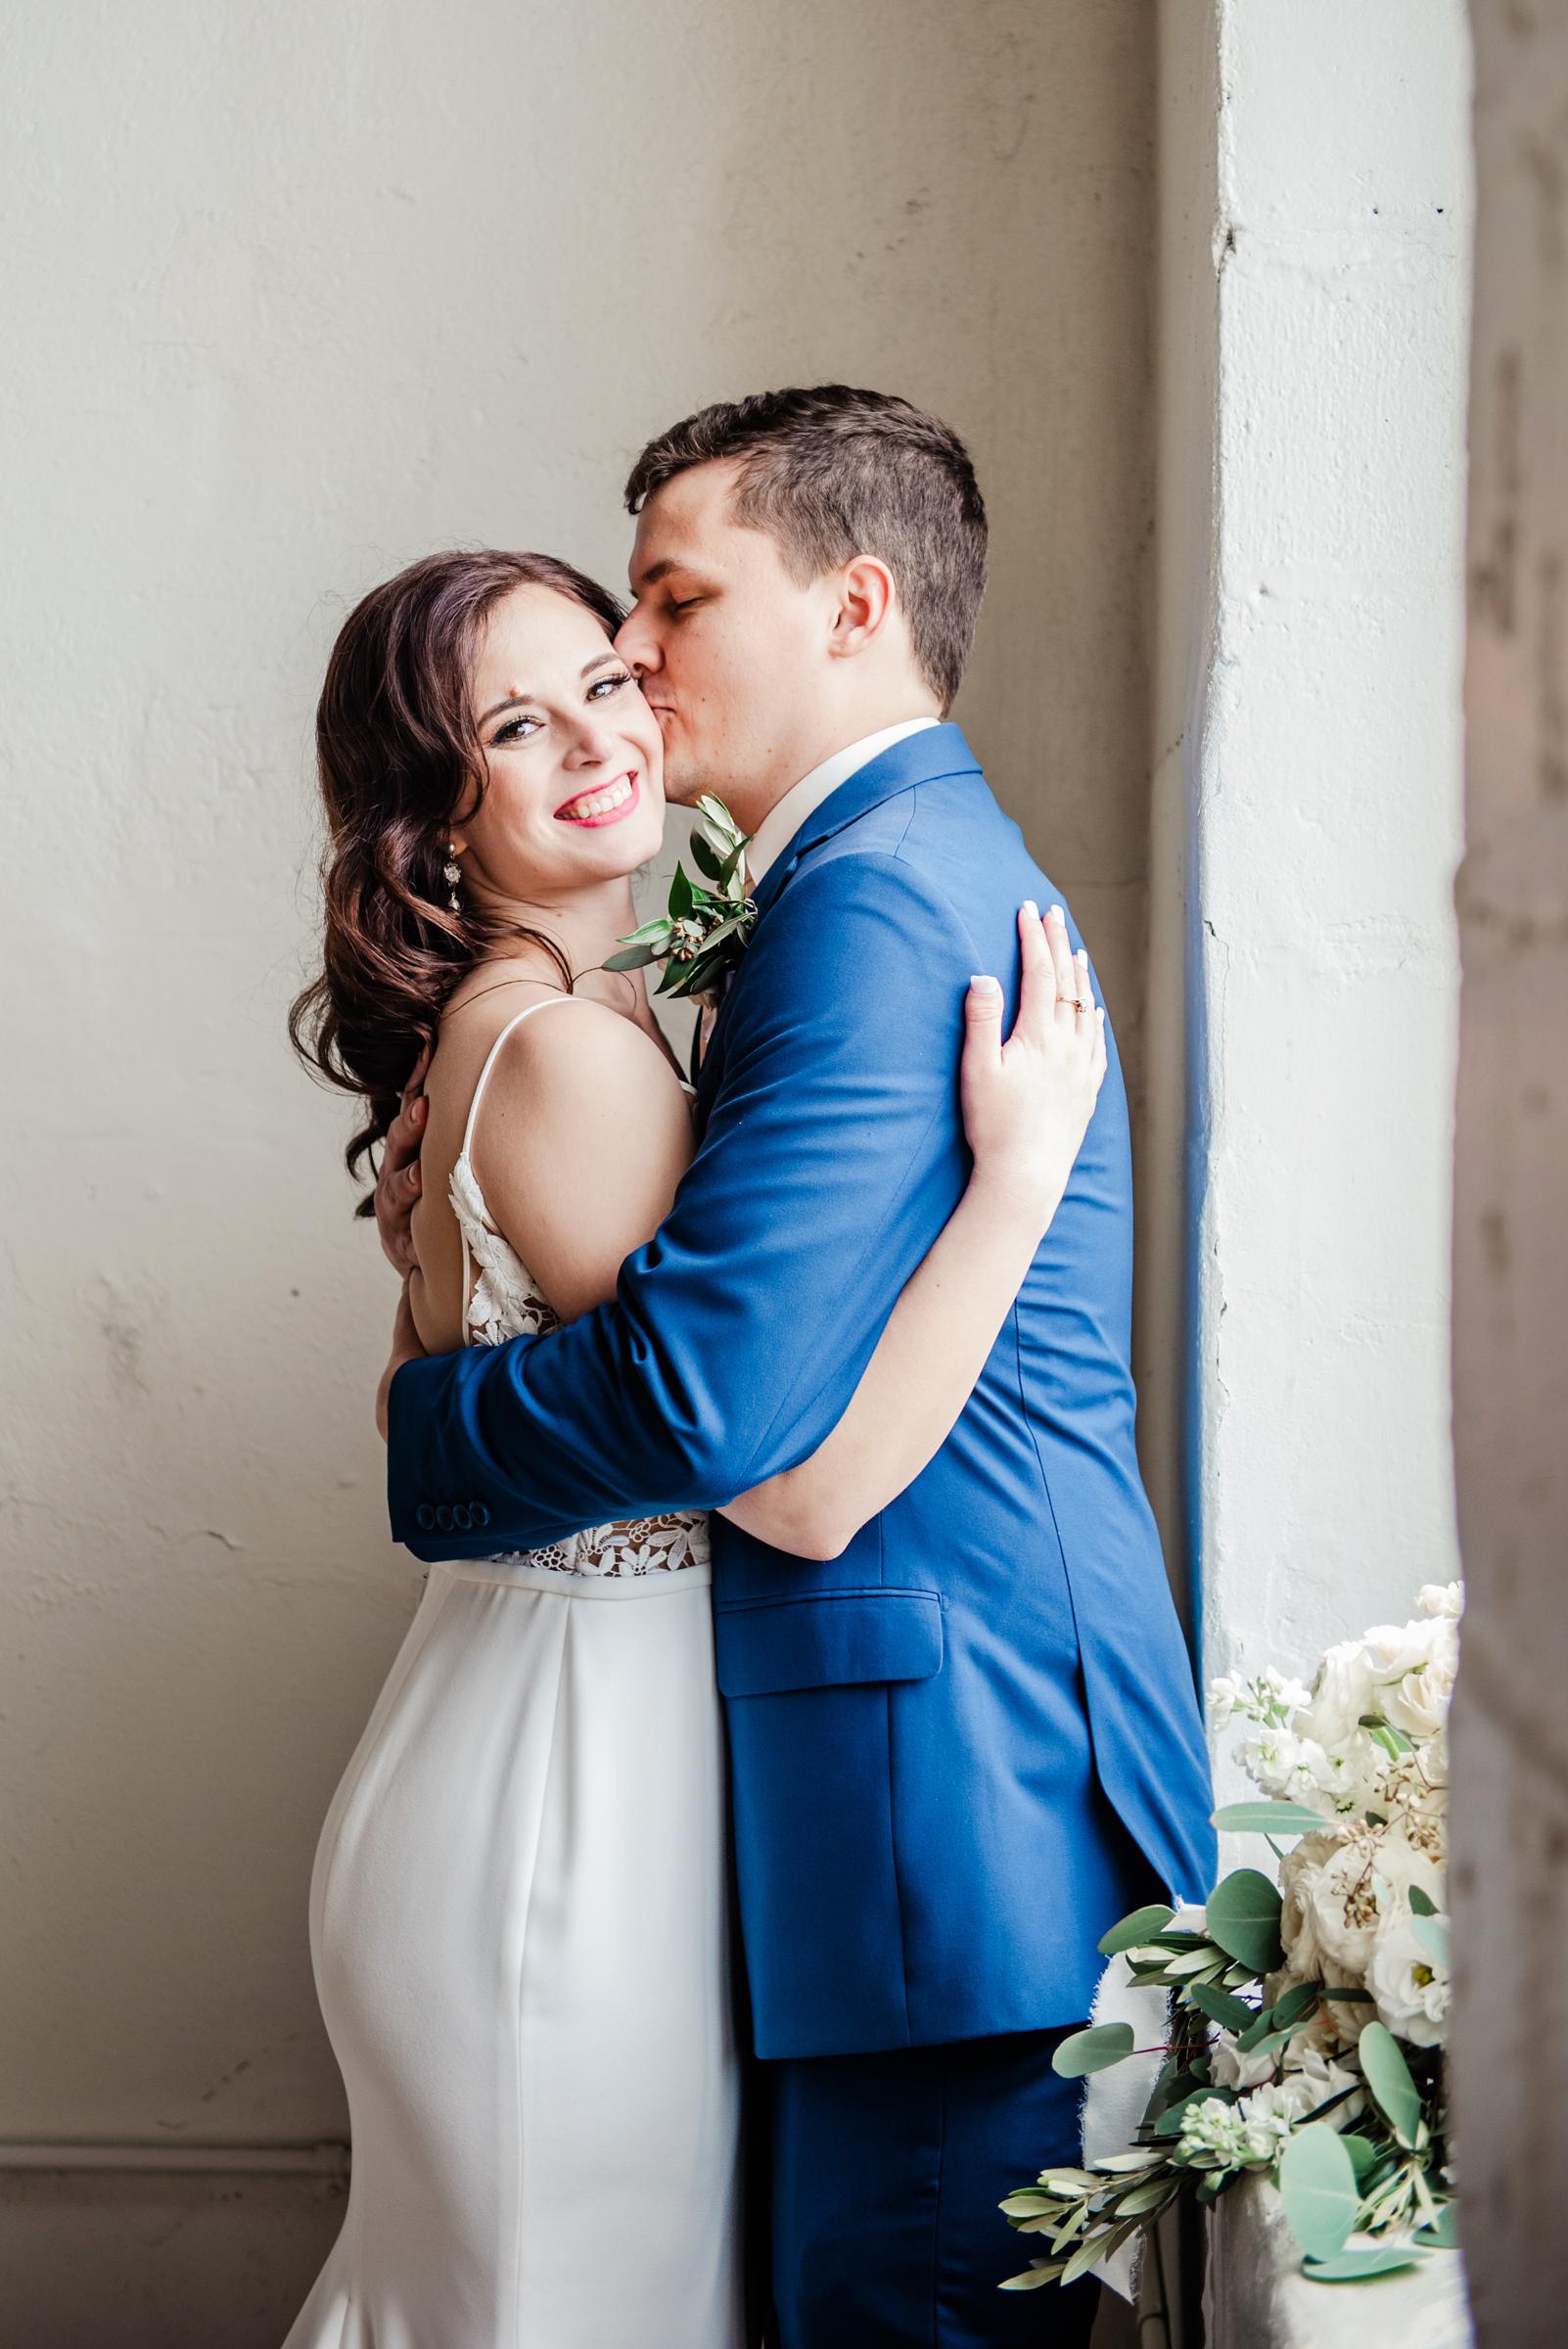 The_Arbor_LoftRochester_Wedding_JILL_STUDIO_Rochester_NY_Photographer_161417.jpg